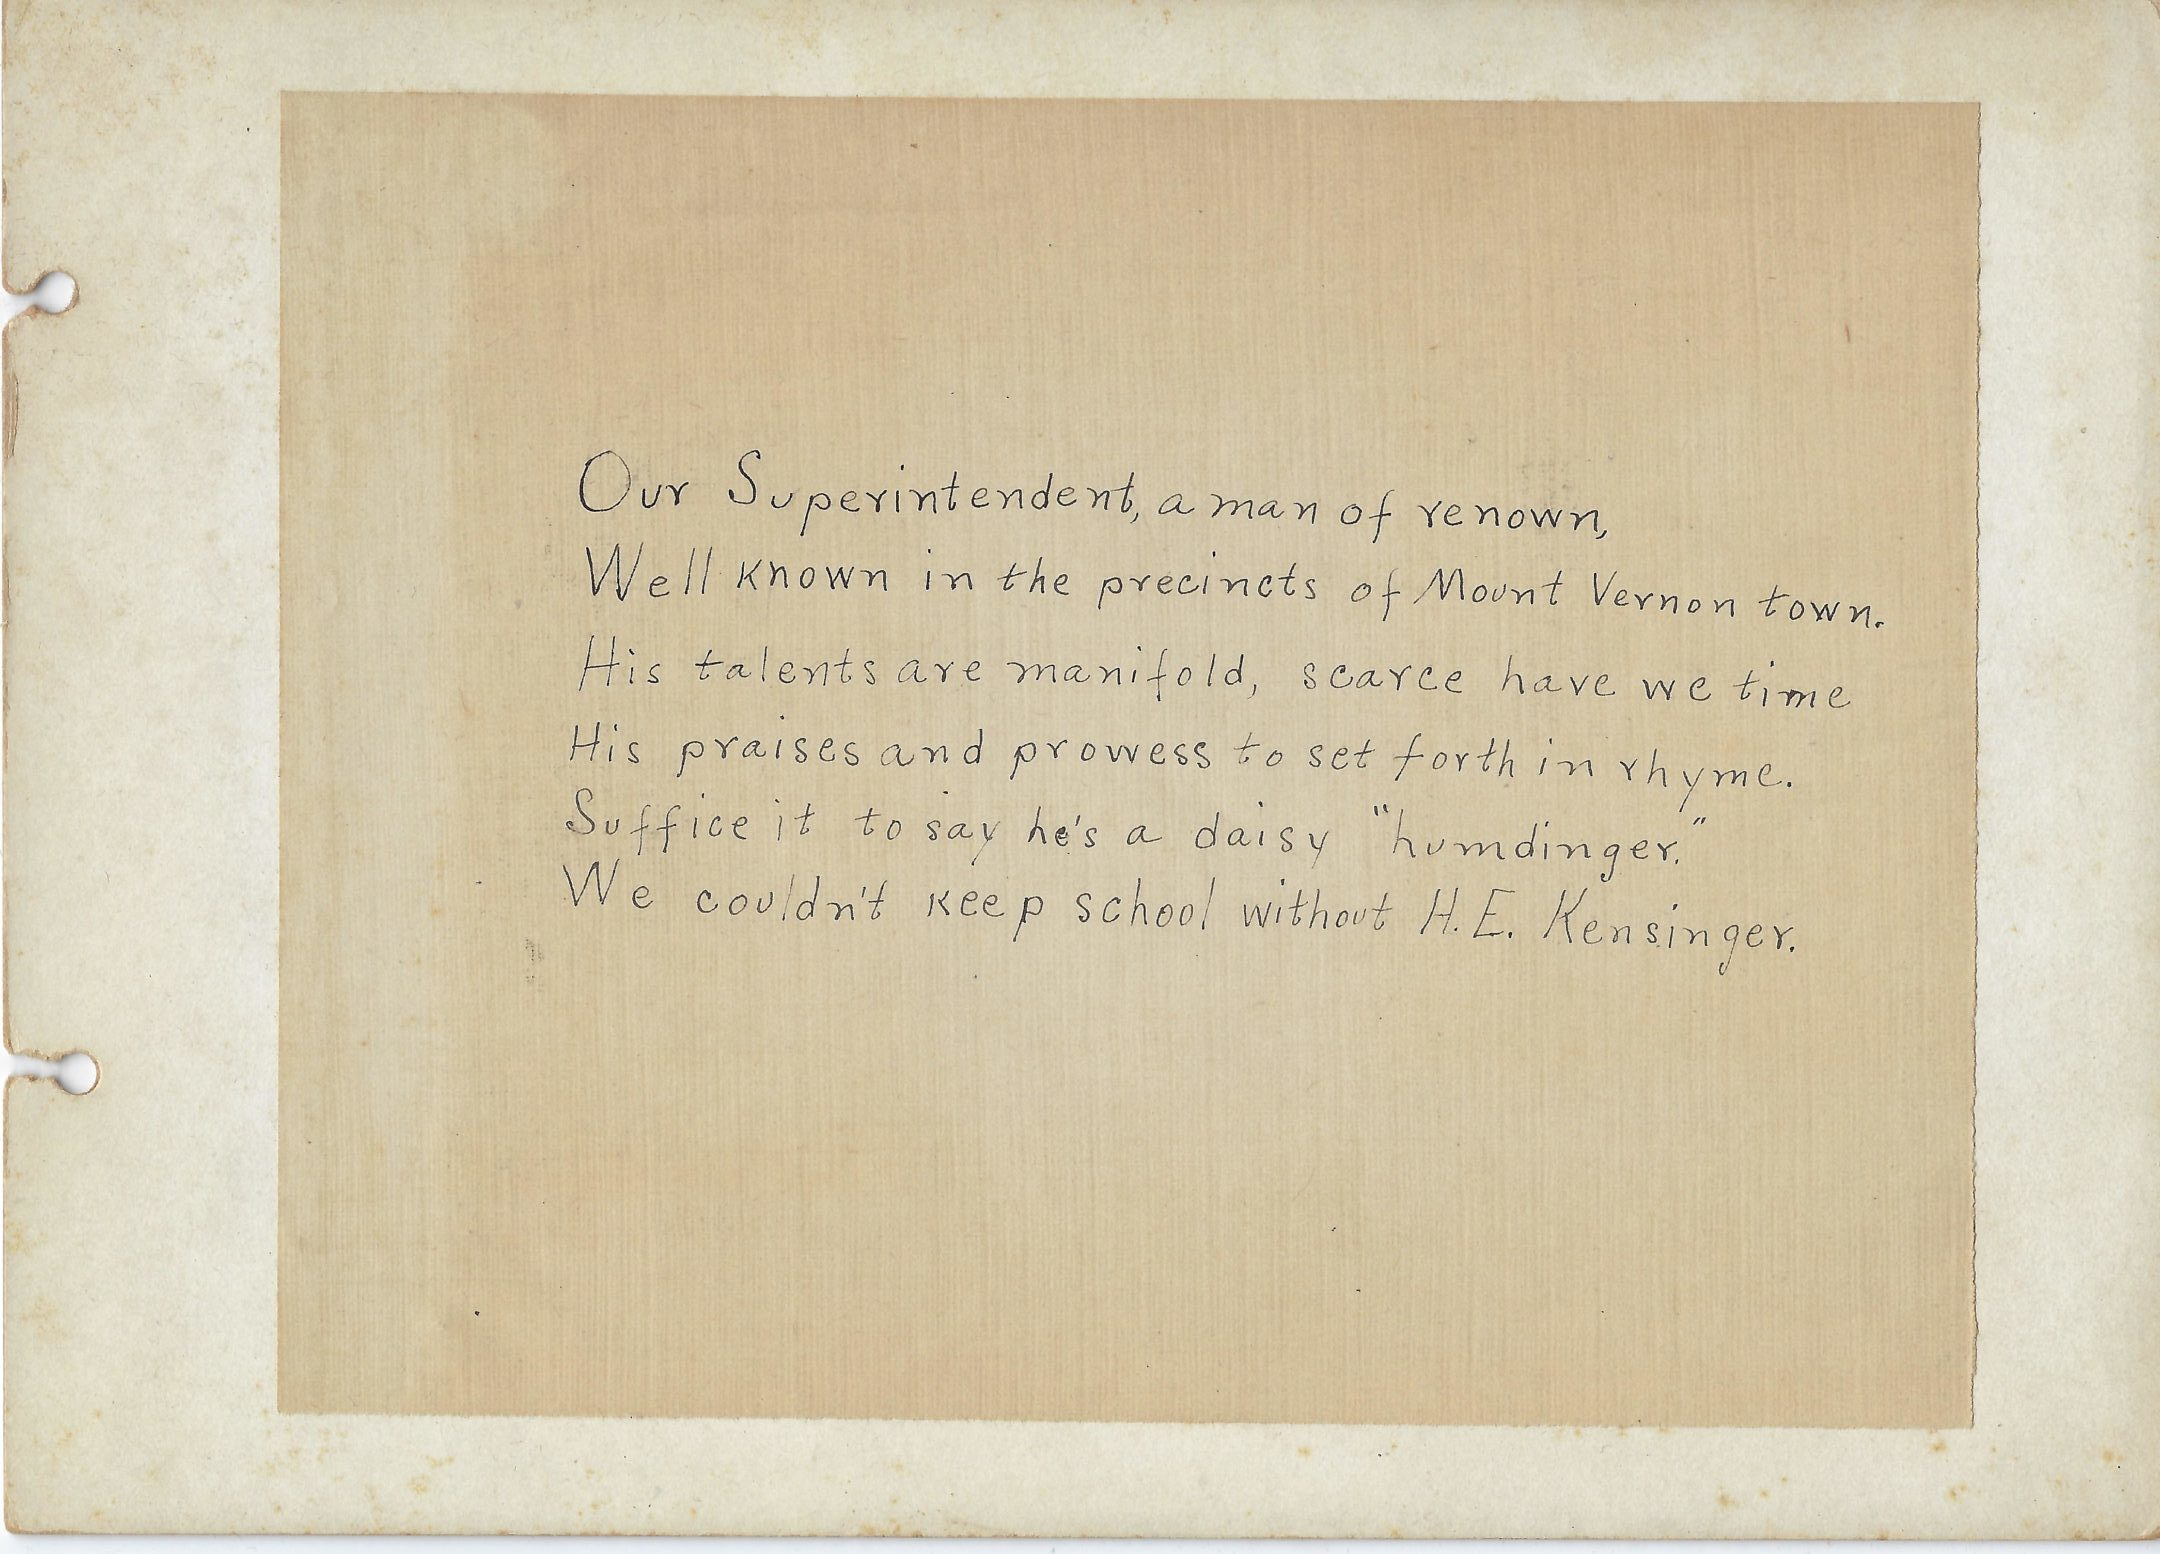 Photo of mount vernon high school project poem